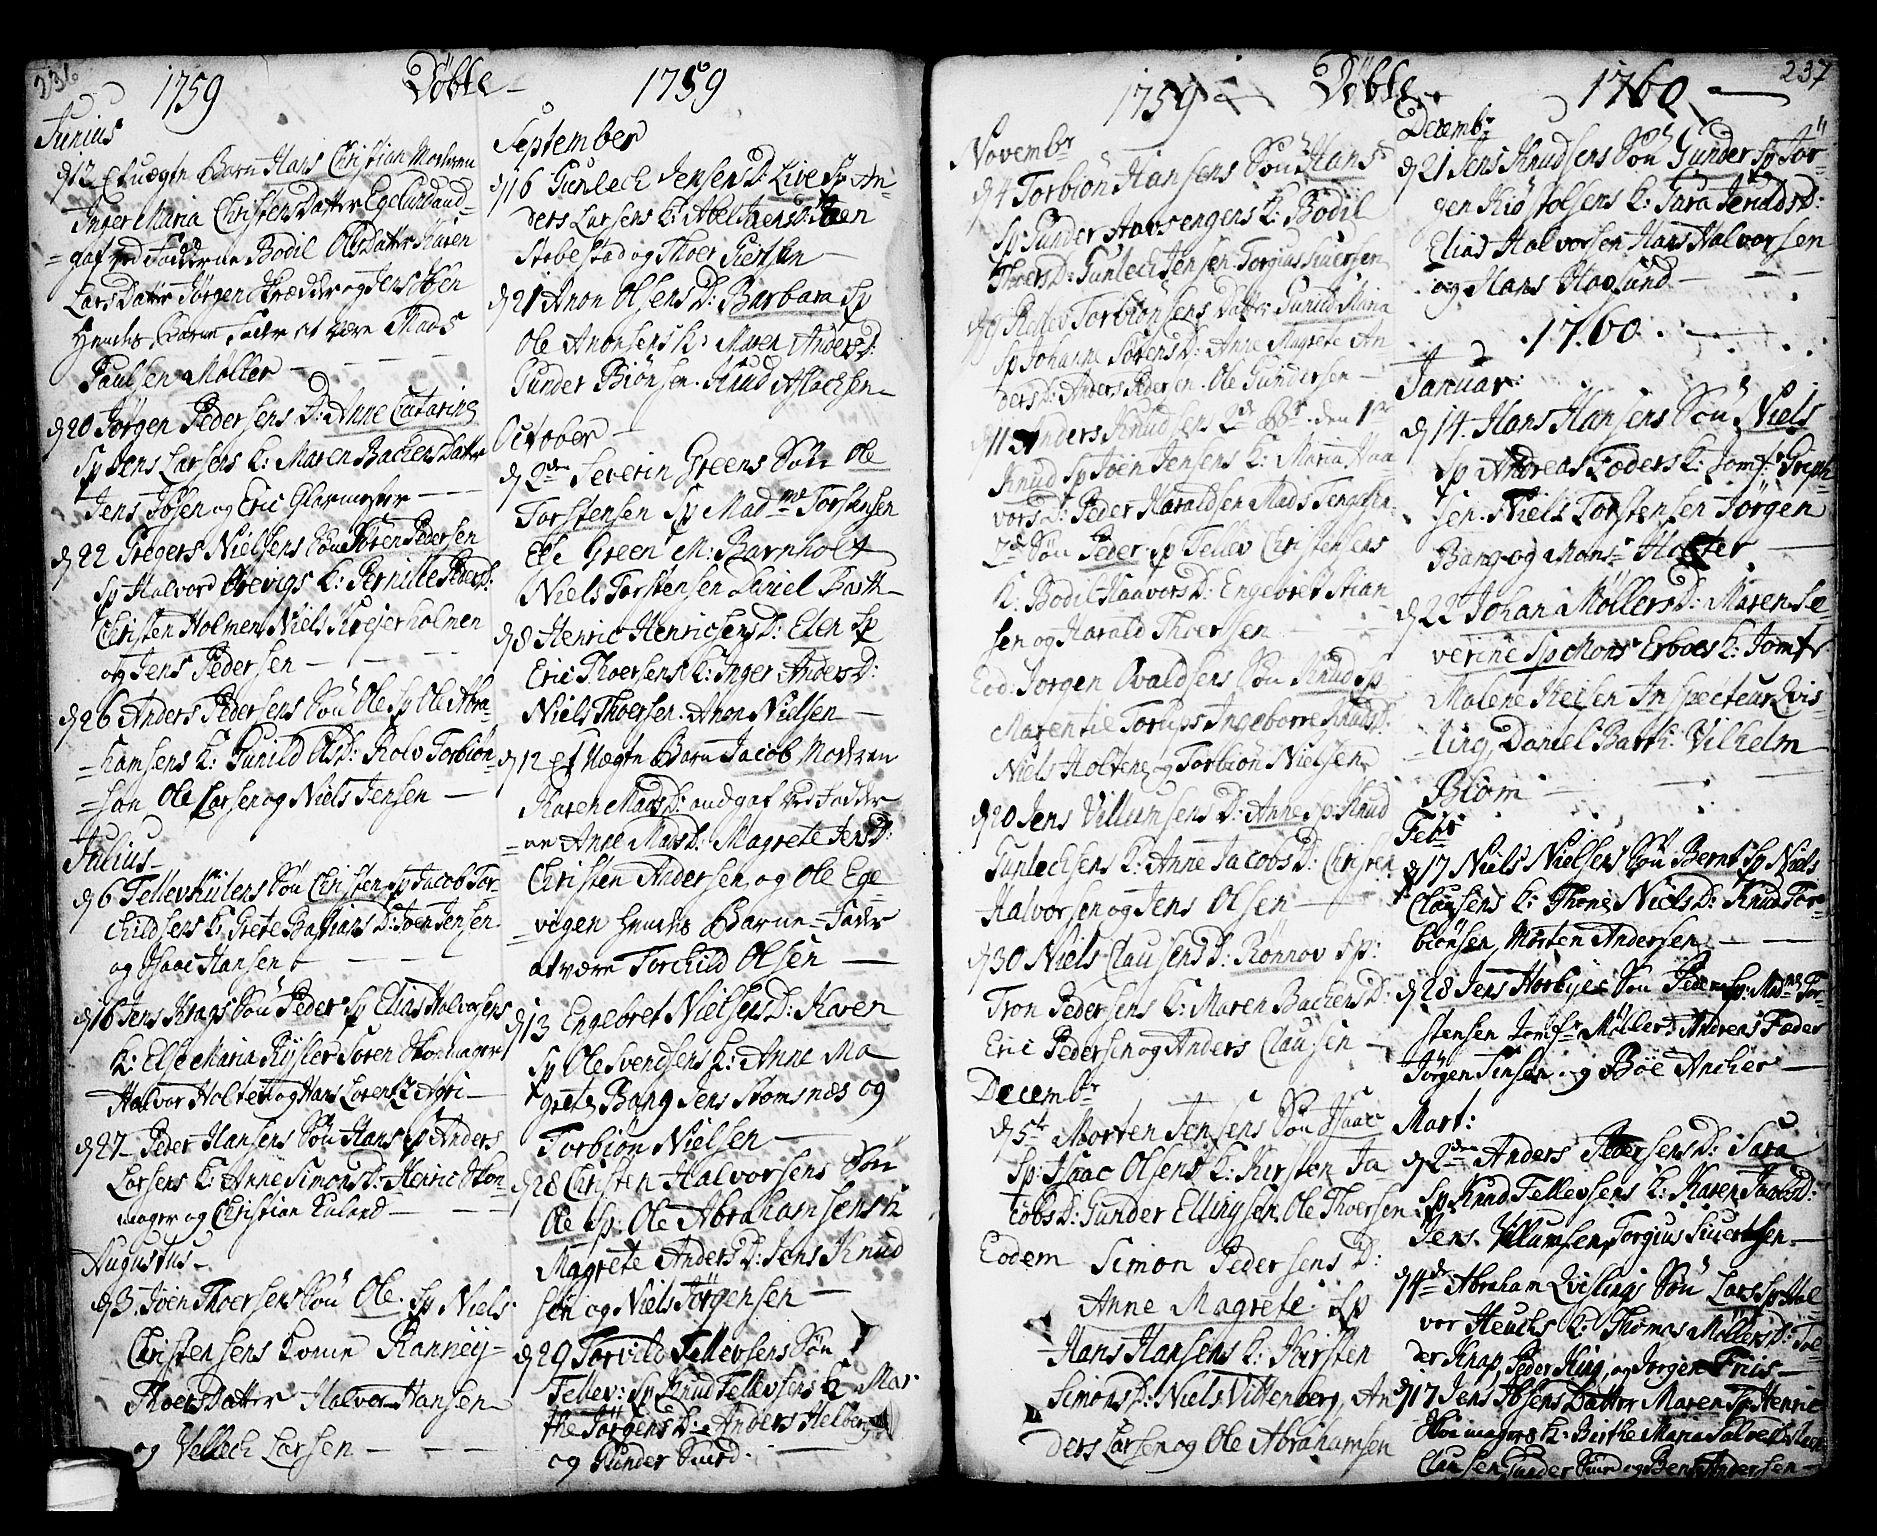 SAKO, Kragerø kirkebøker, F/Fa/L0001: Ministerialbok nr. 1, 1702-1766, s. 236-237